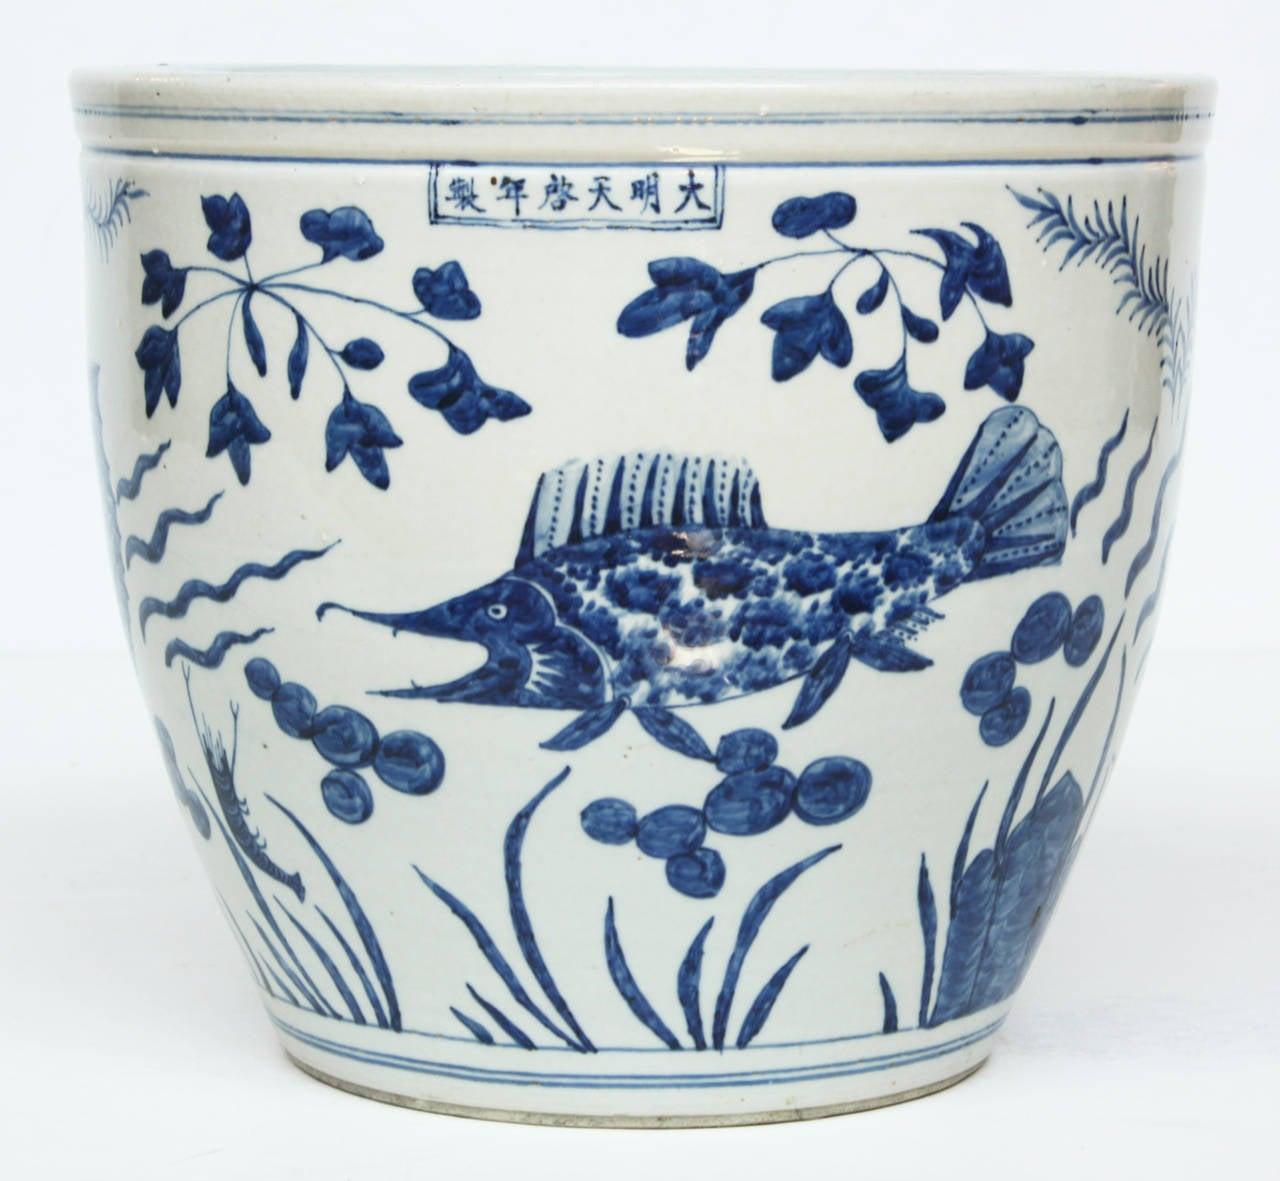 19th century chinese fish bowl ming style koi and shrimp for Koi fish bowl